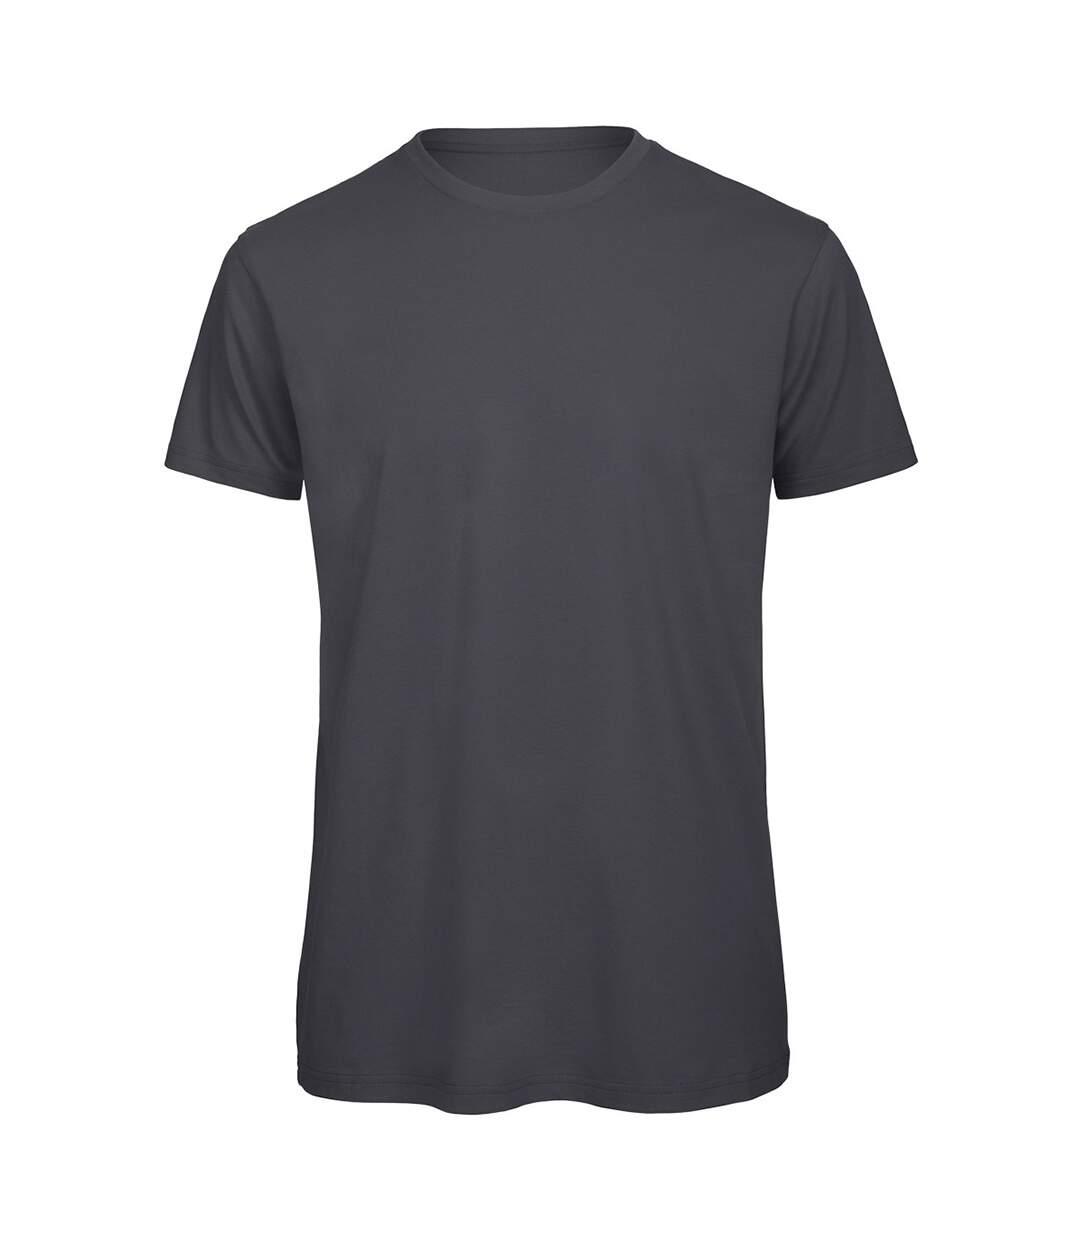 B&C Mens Favourite Organic Cotton Crew T-Shirt (Dark Grey) - UTBC3635